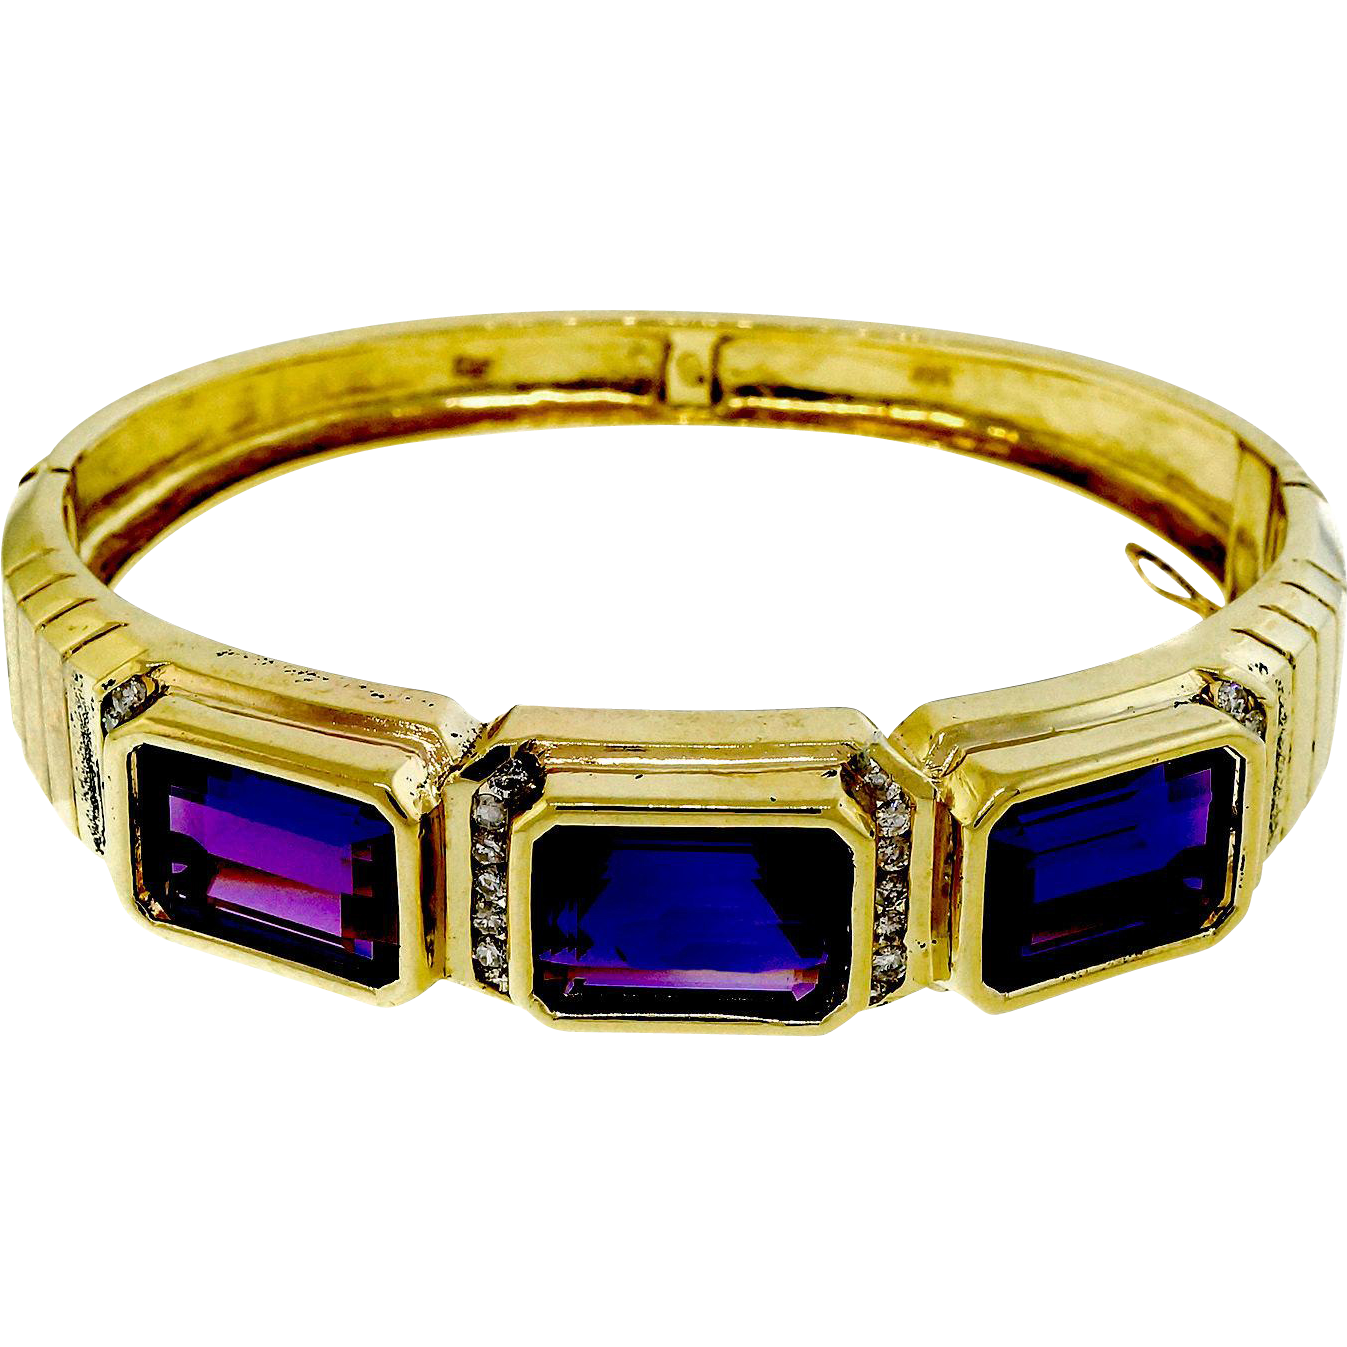 Vintage Amethyst Diamond 14 Karat Yellow Gold Bangle Bracelet